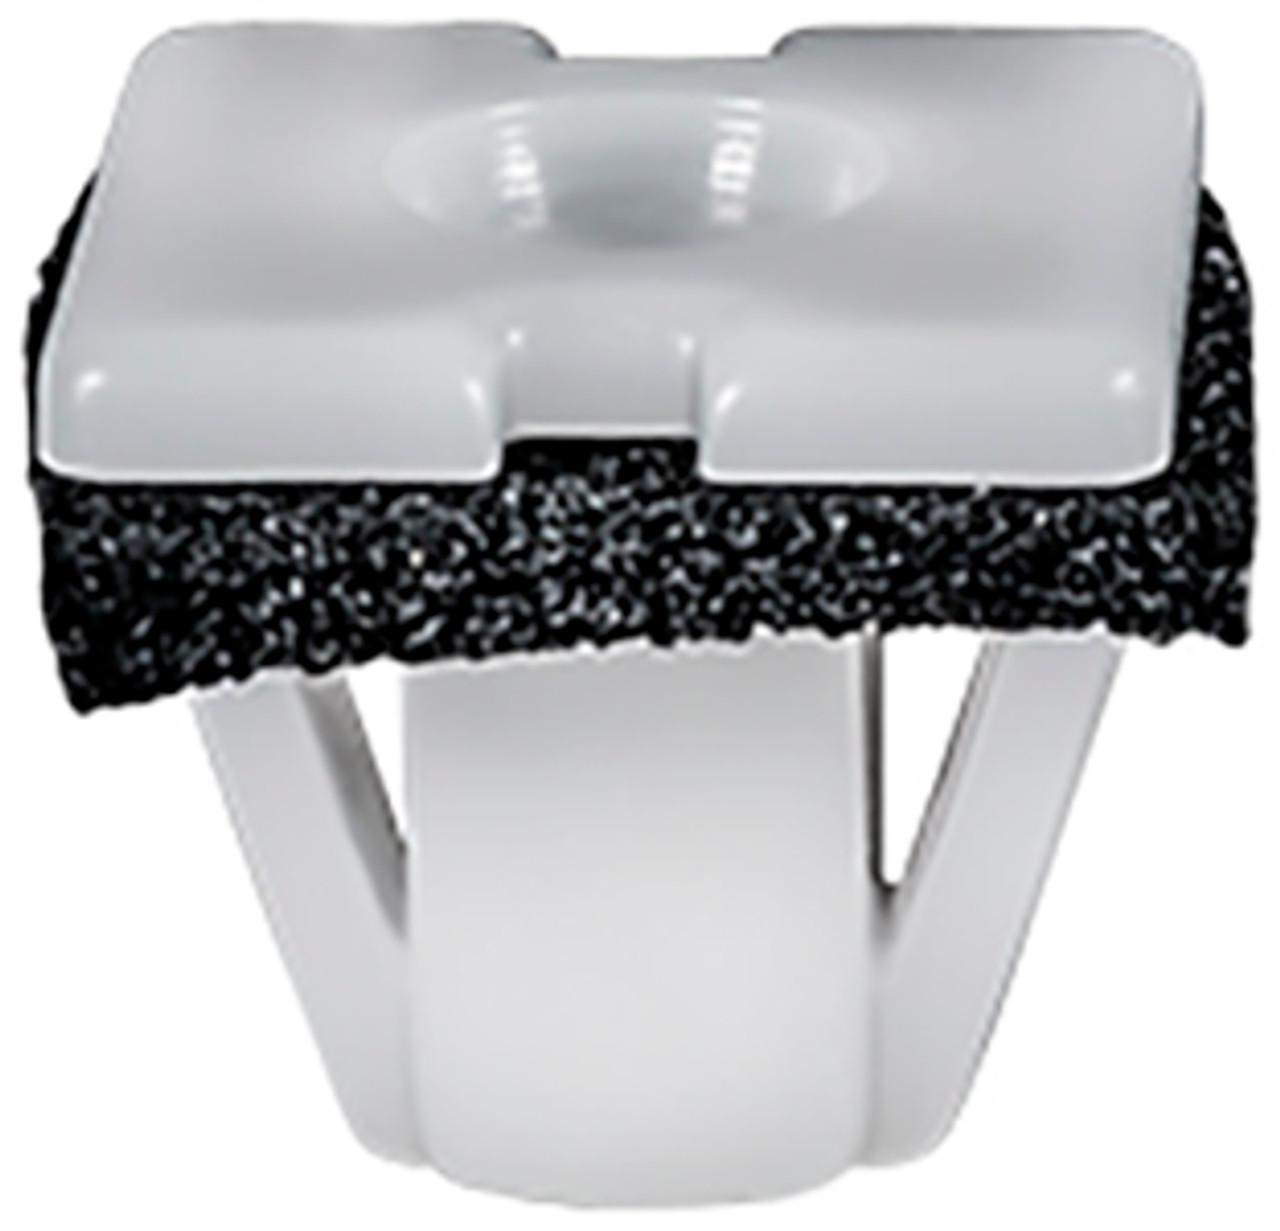 Emblem & Rocker Moulding Nylon Nut With Sealer White Nylon Screw Size: M3.5 (#6) Head Size: 13mm x 13mm Stem Diameter: 12mm Stem Length: 10mm Hyundai Genesis & Santa Fe 2007 - On OEM# 87756-26900 50 Per Box